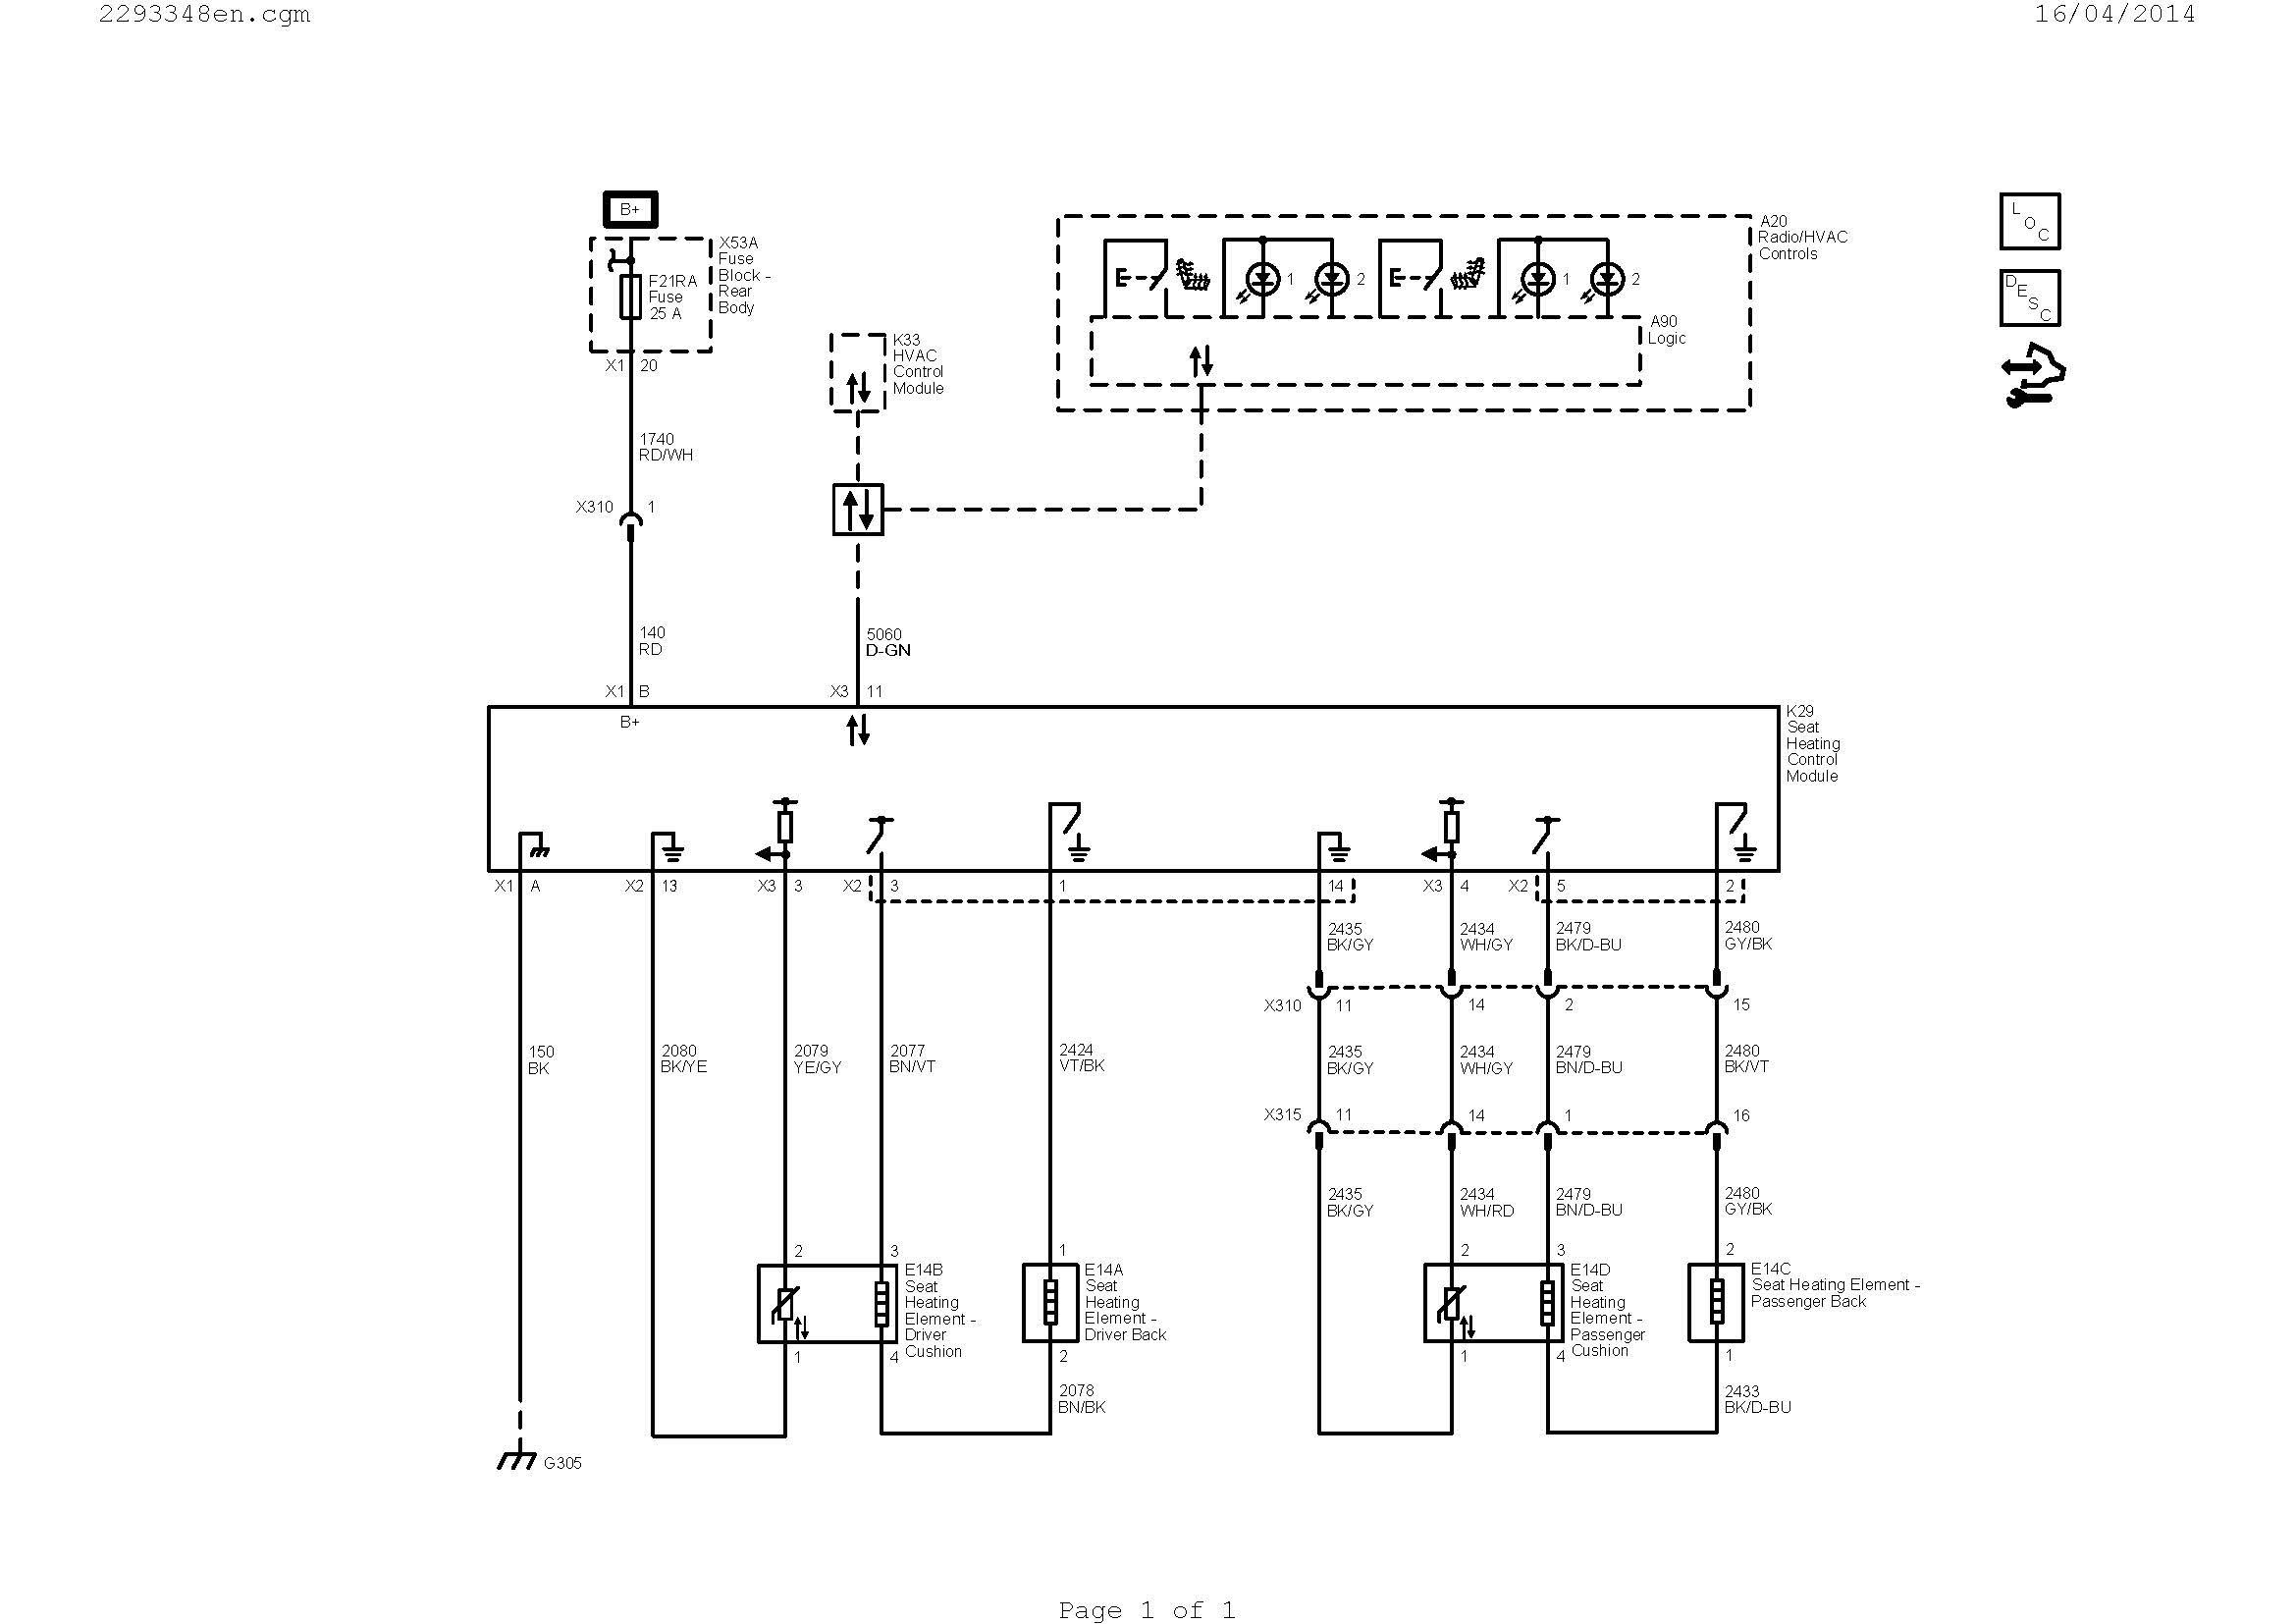 Stop Light Diagram Rc Wiring Diagrams 3 Cha Wiring Diagram General Of Stop Light Diagram